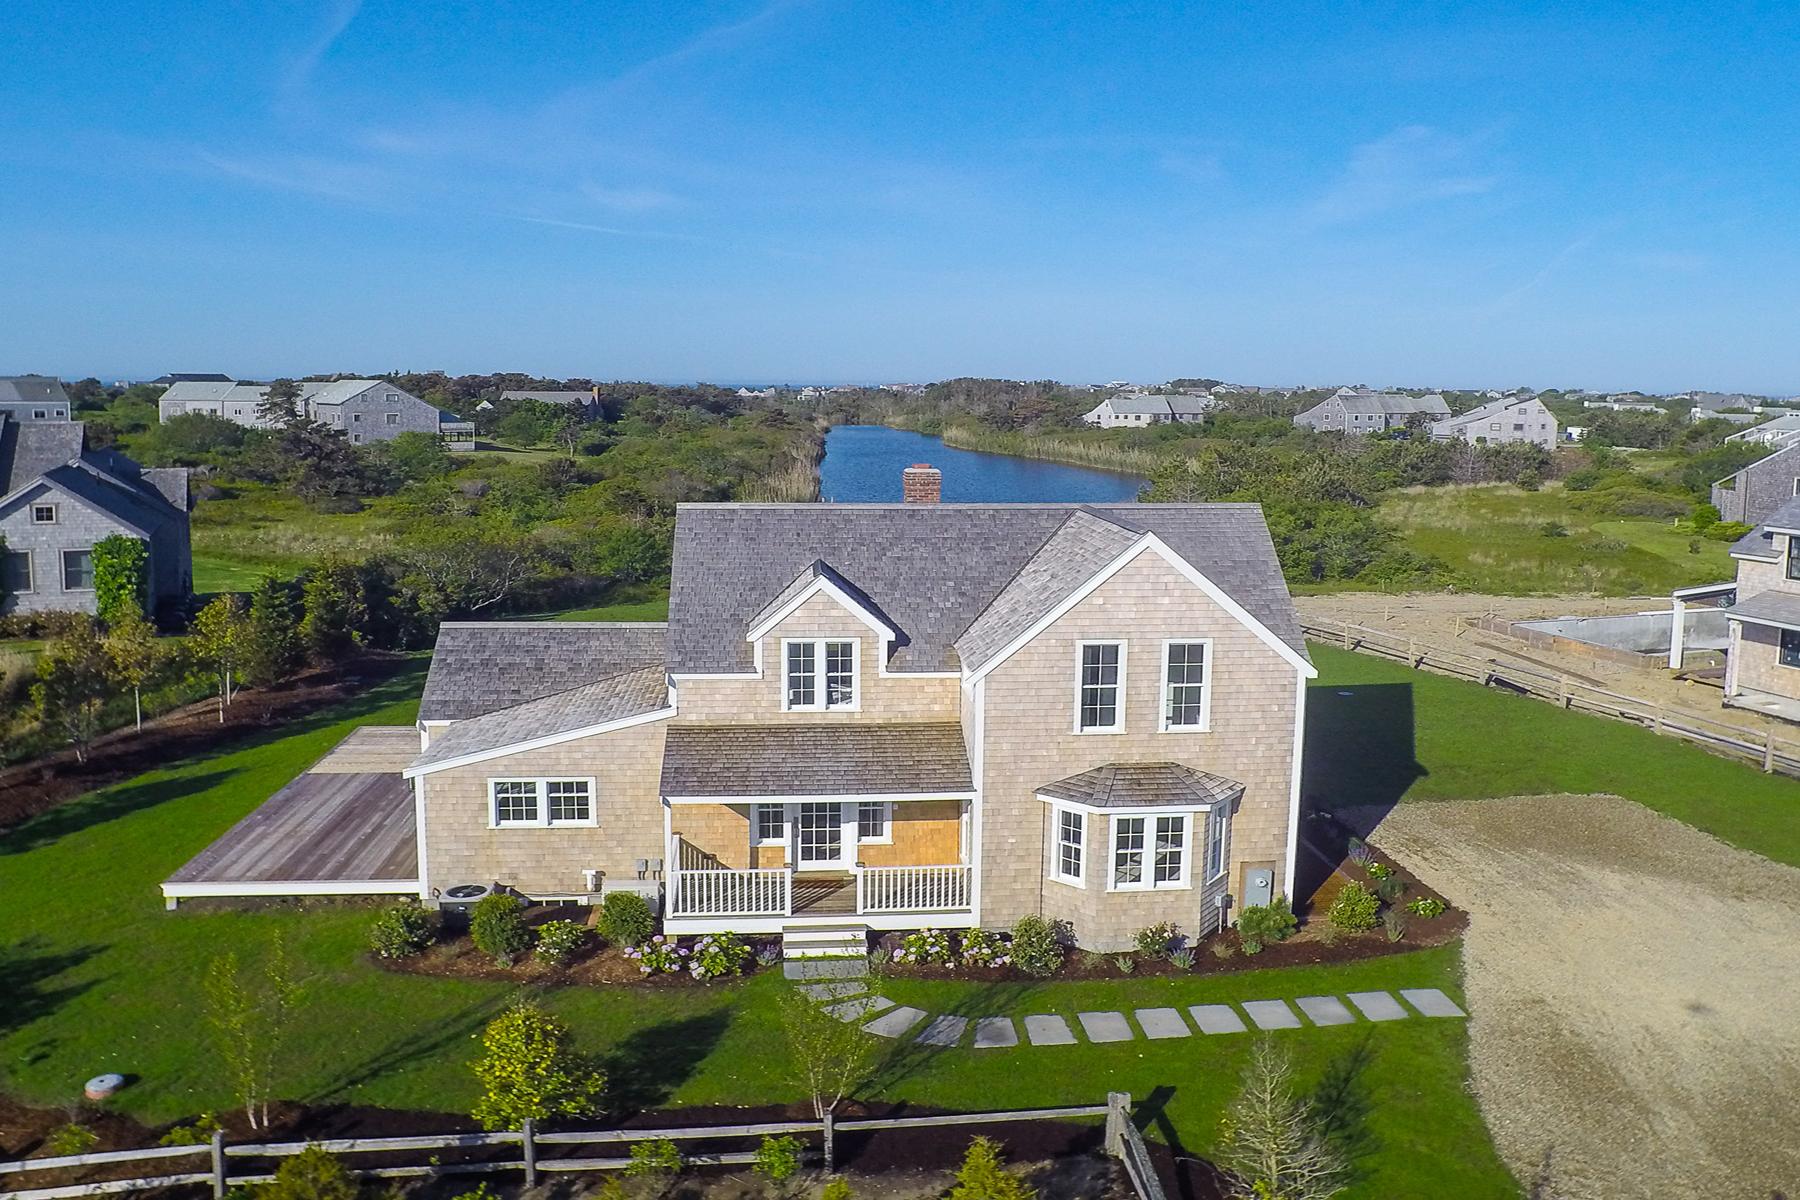 Moradia para Venda às Spectacular Views and the Sound of the Ocean 4 Goose Cove Way Nantucket, Massachusetts, 02554 Estados Unidos